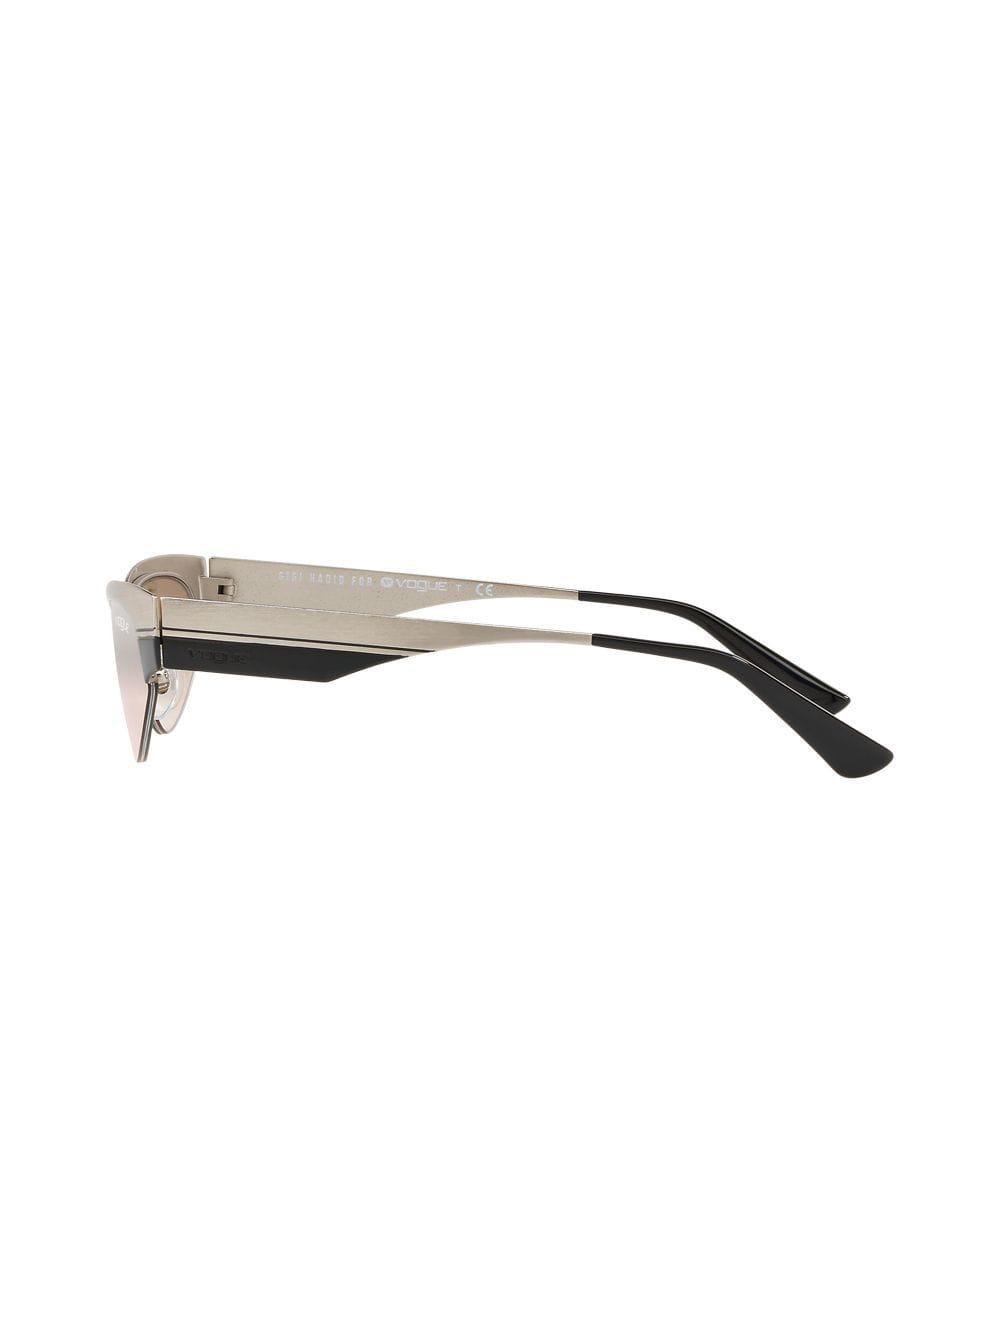 Metallic Vogue Low In Sunglasses Eyewear Lyst Frame q1vgZ